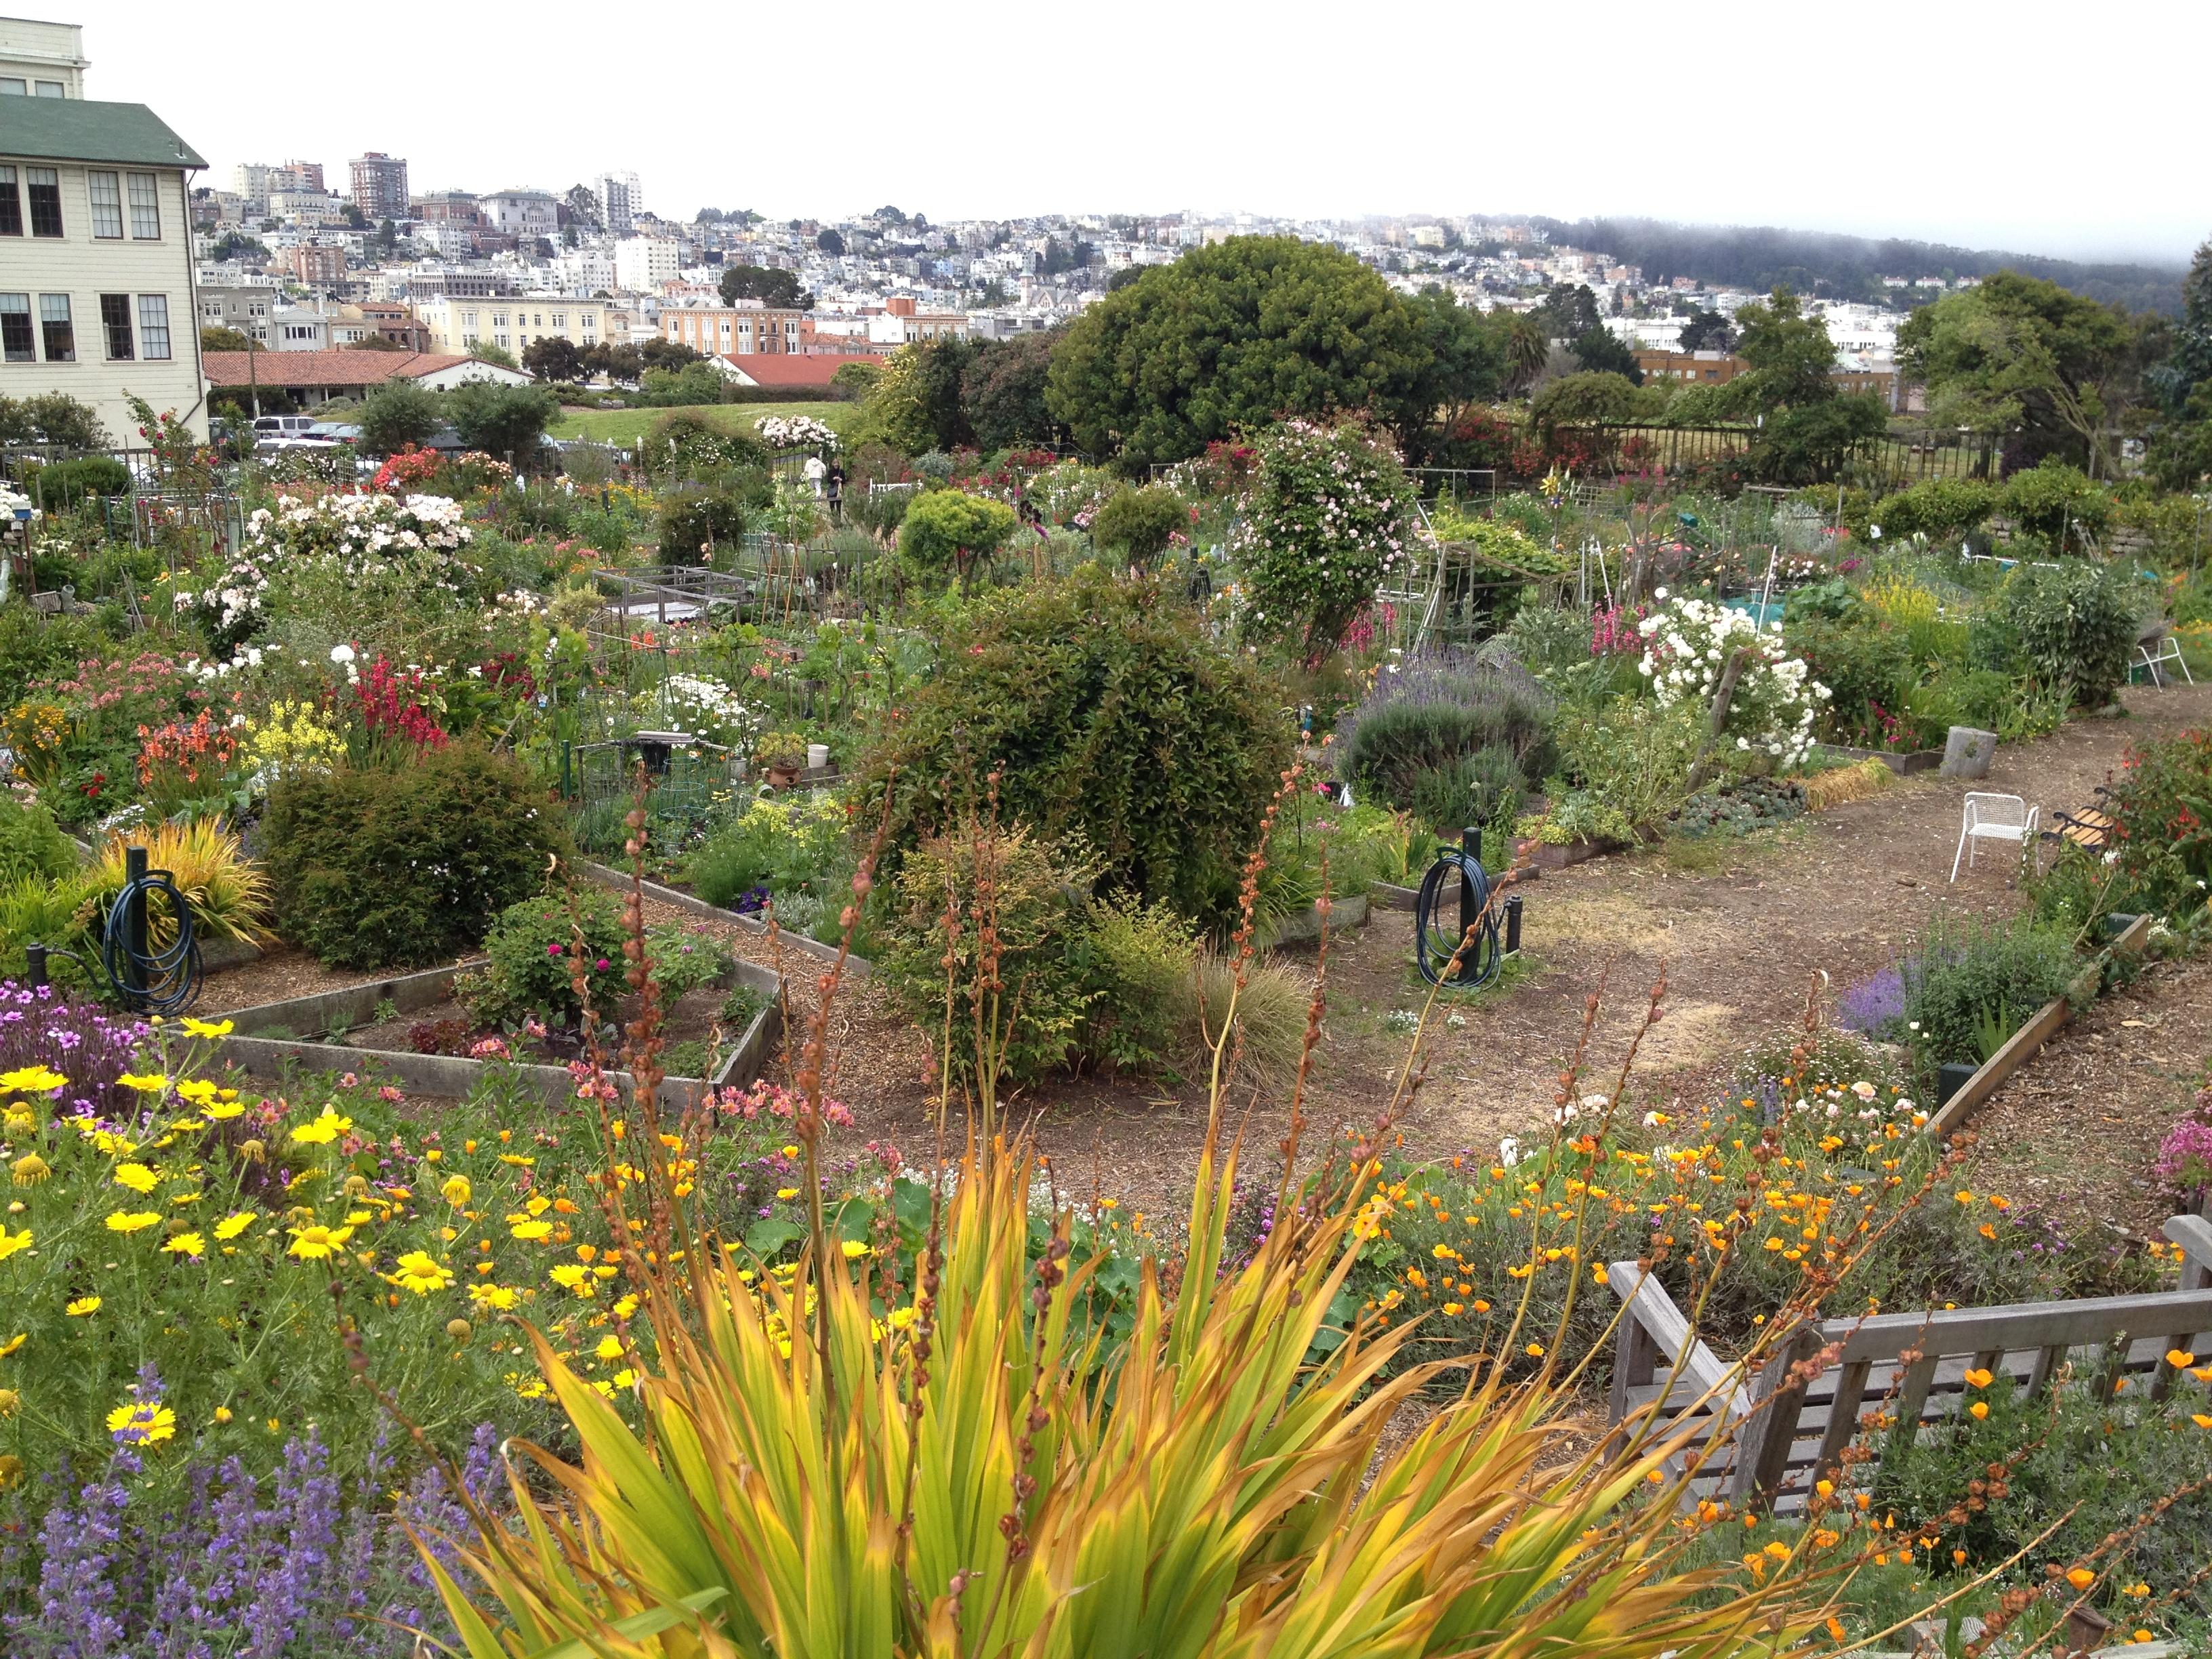 The Fort Mason Community Garden in San Francisco